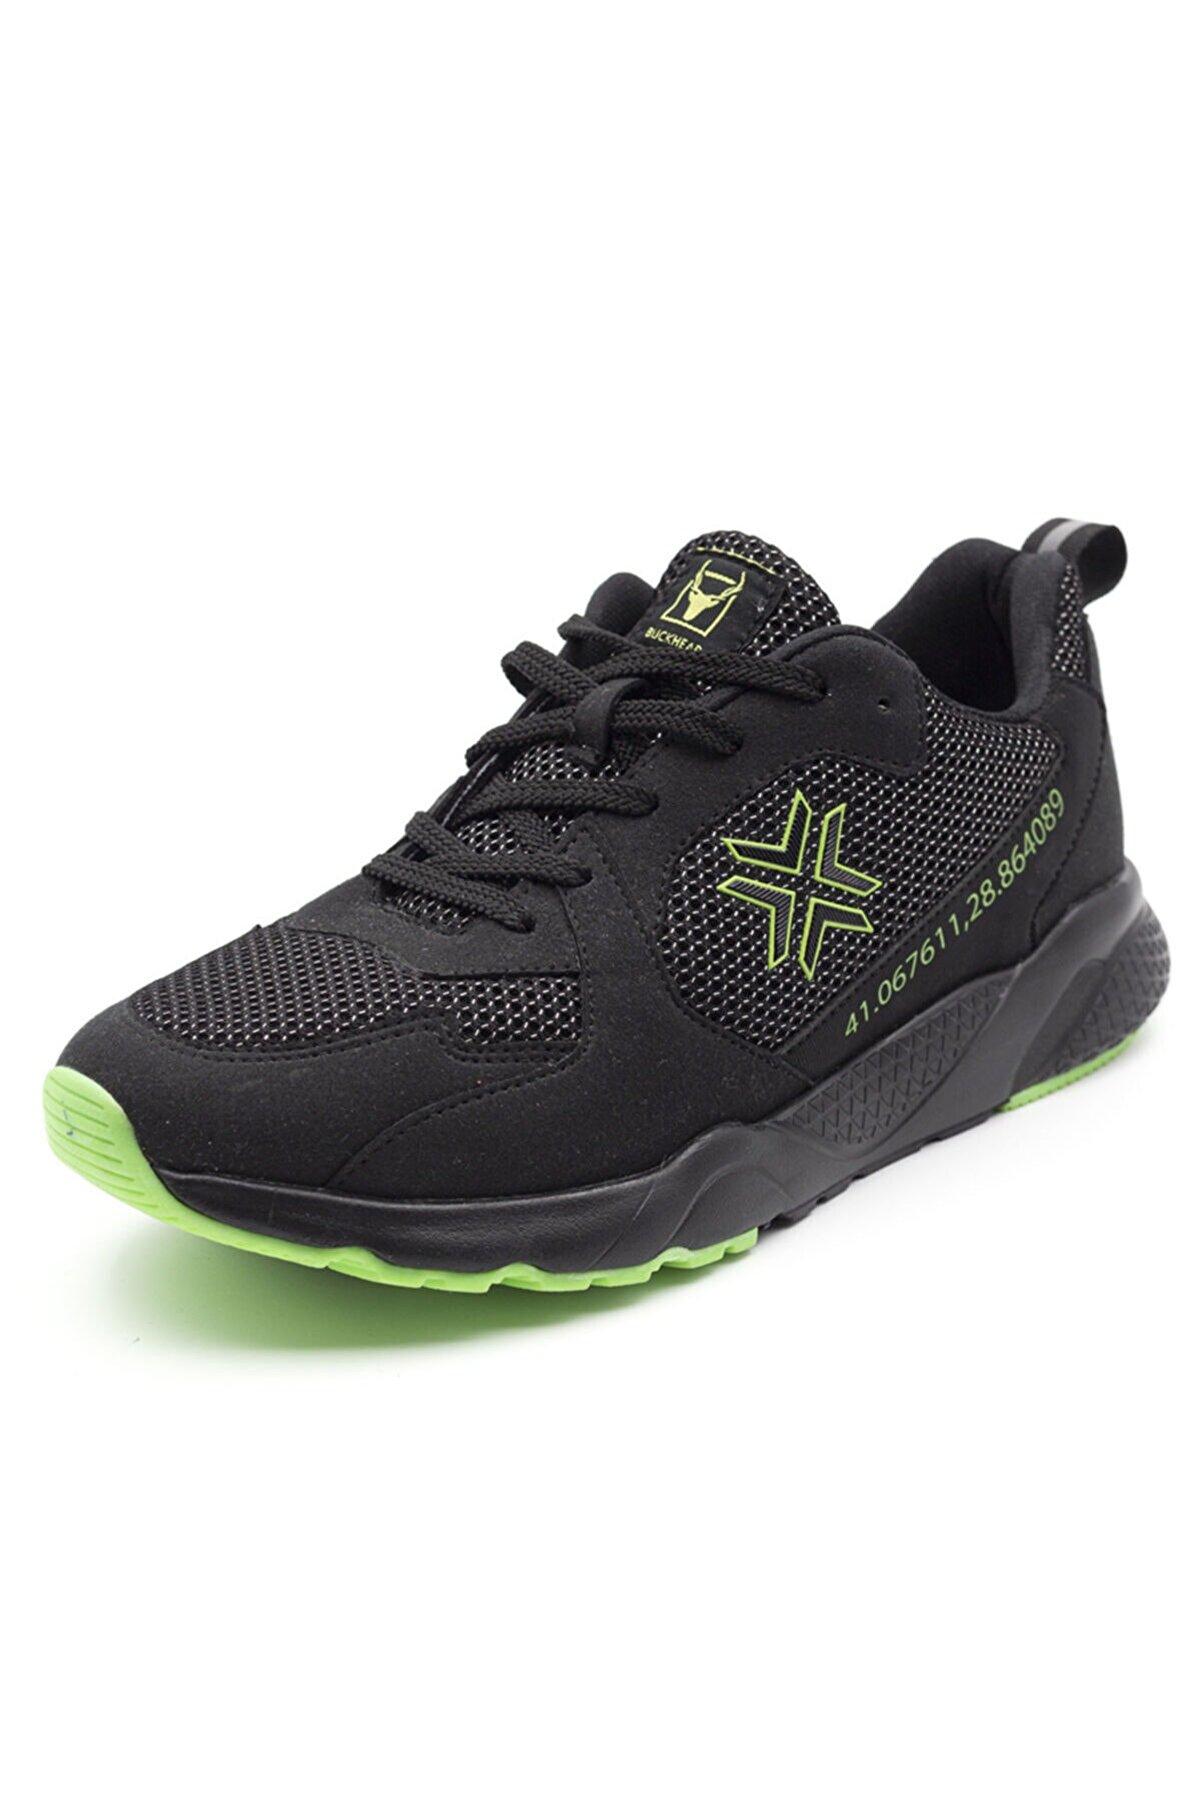 BUCKHEAD Unisex Sneaker